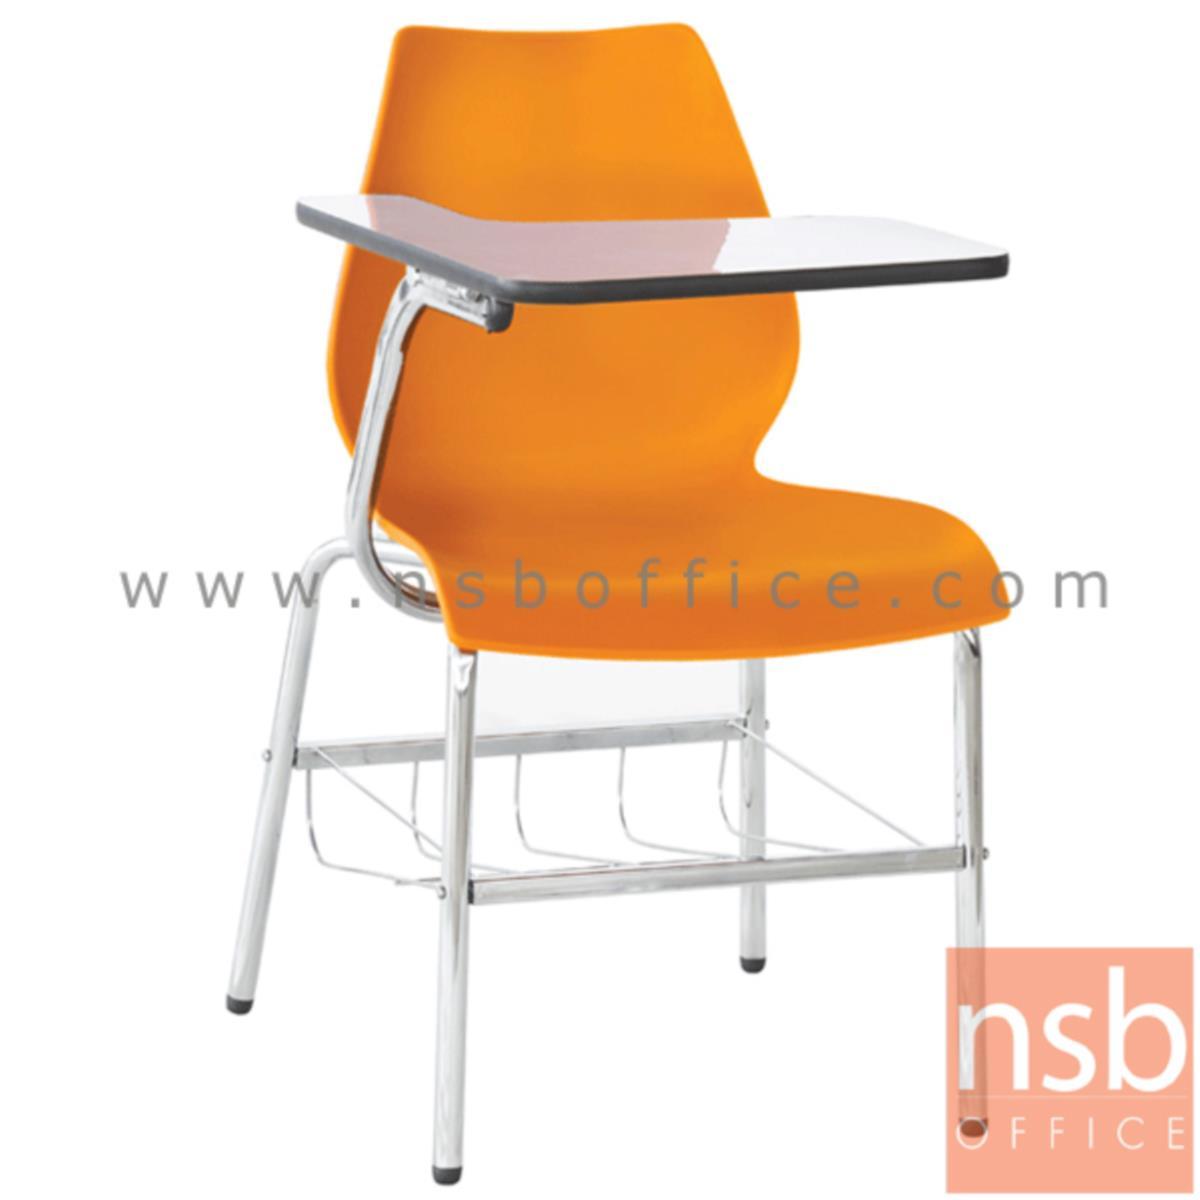 B07A089:เก้าอี้เลคเชอร์เฟรมโพลี่ (มีตะแกรงวางของ) ขาเหล็กโครเมี่ยม รุ่น B208,308